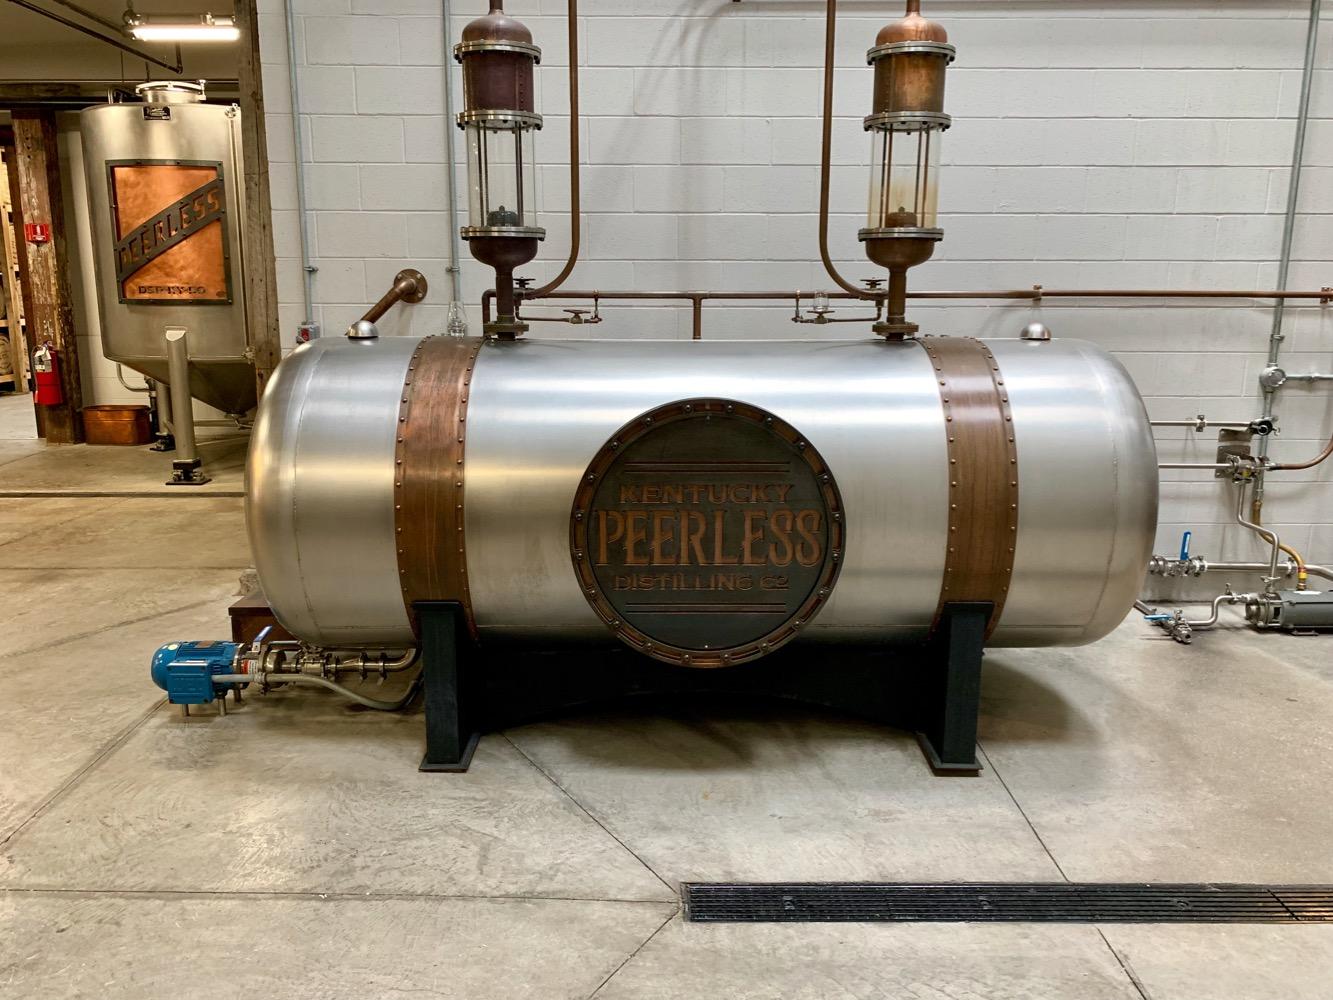 Kentucky Peerless Distilling - Low-High Wine